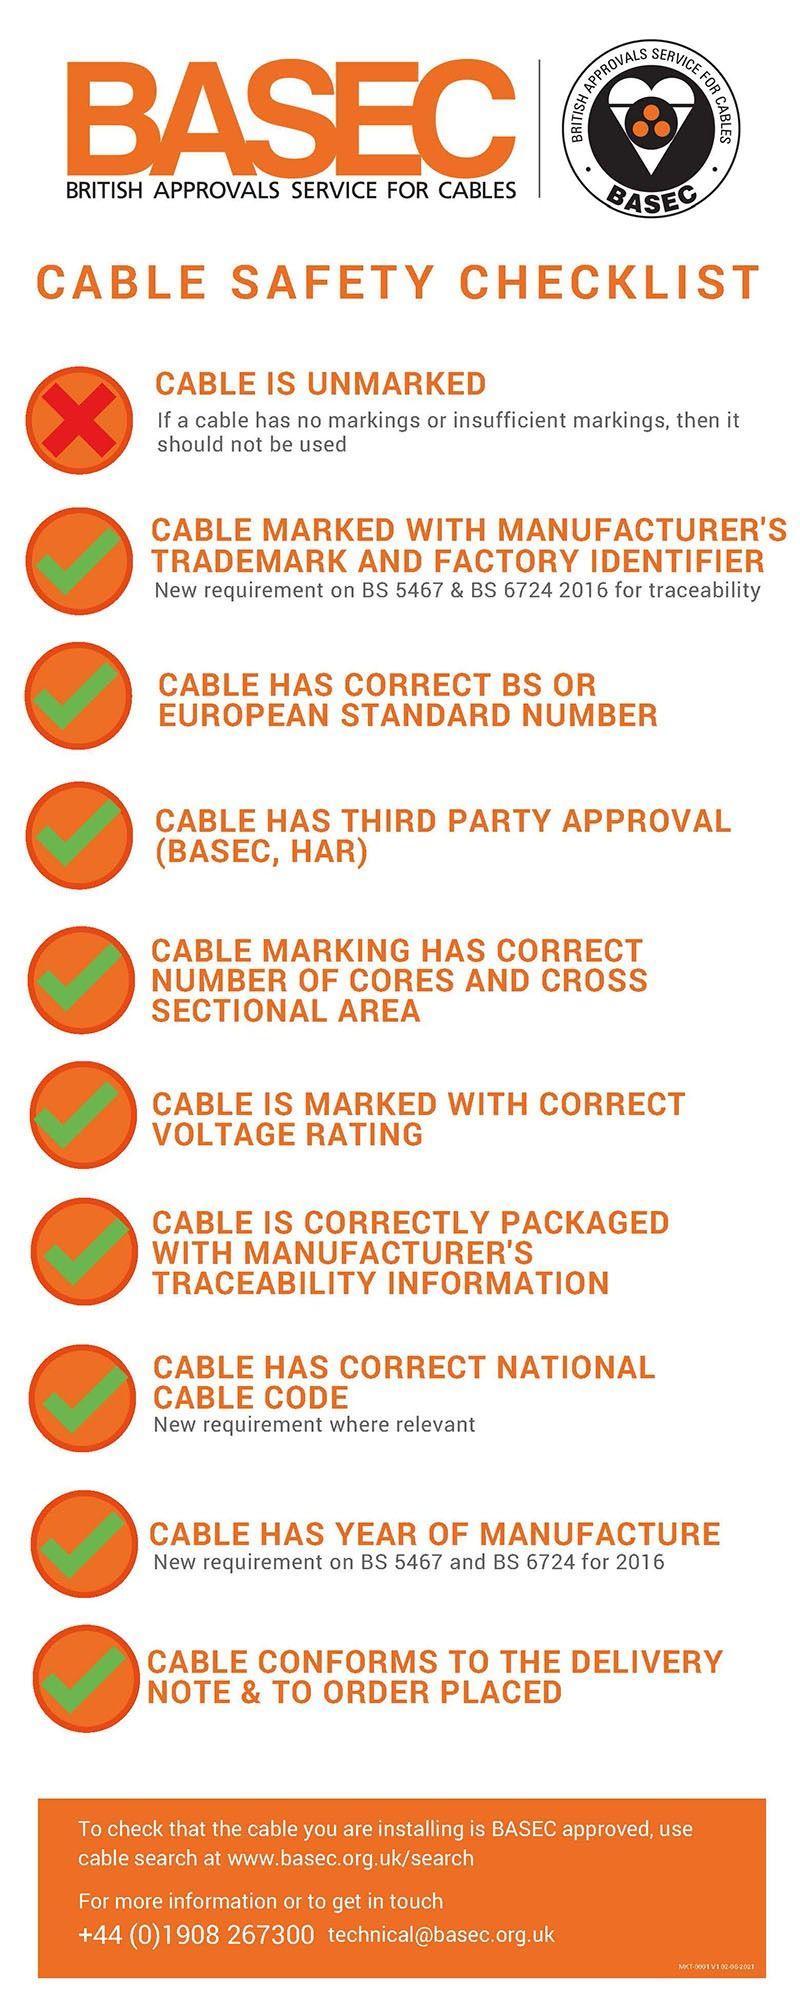 Cable Safety Checklist Mkt 0001 V1 02 08 2021